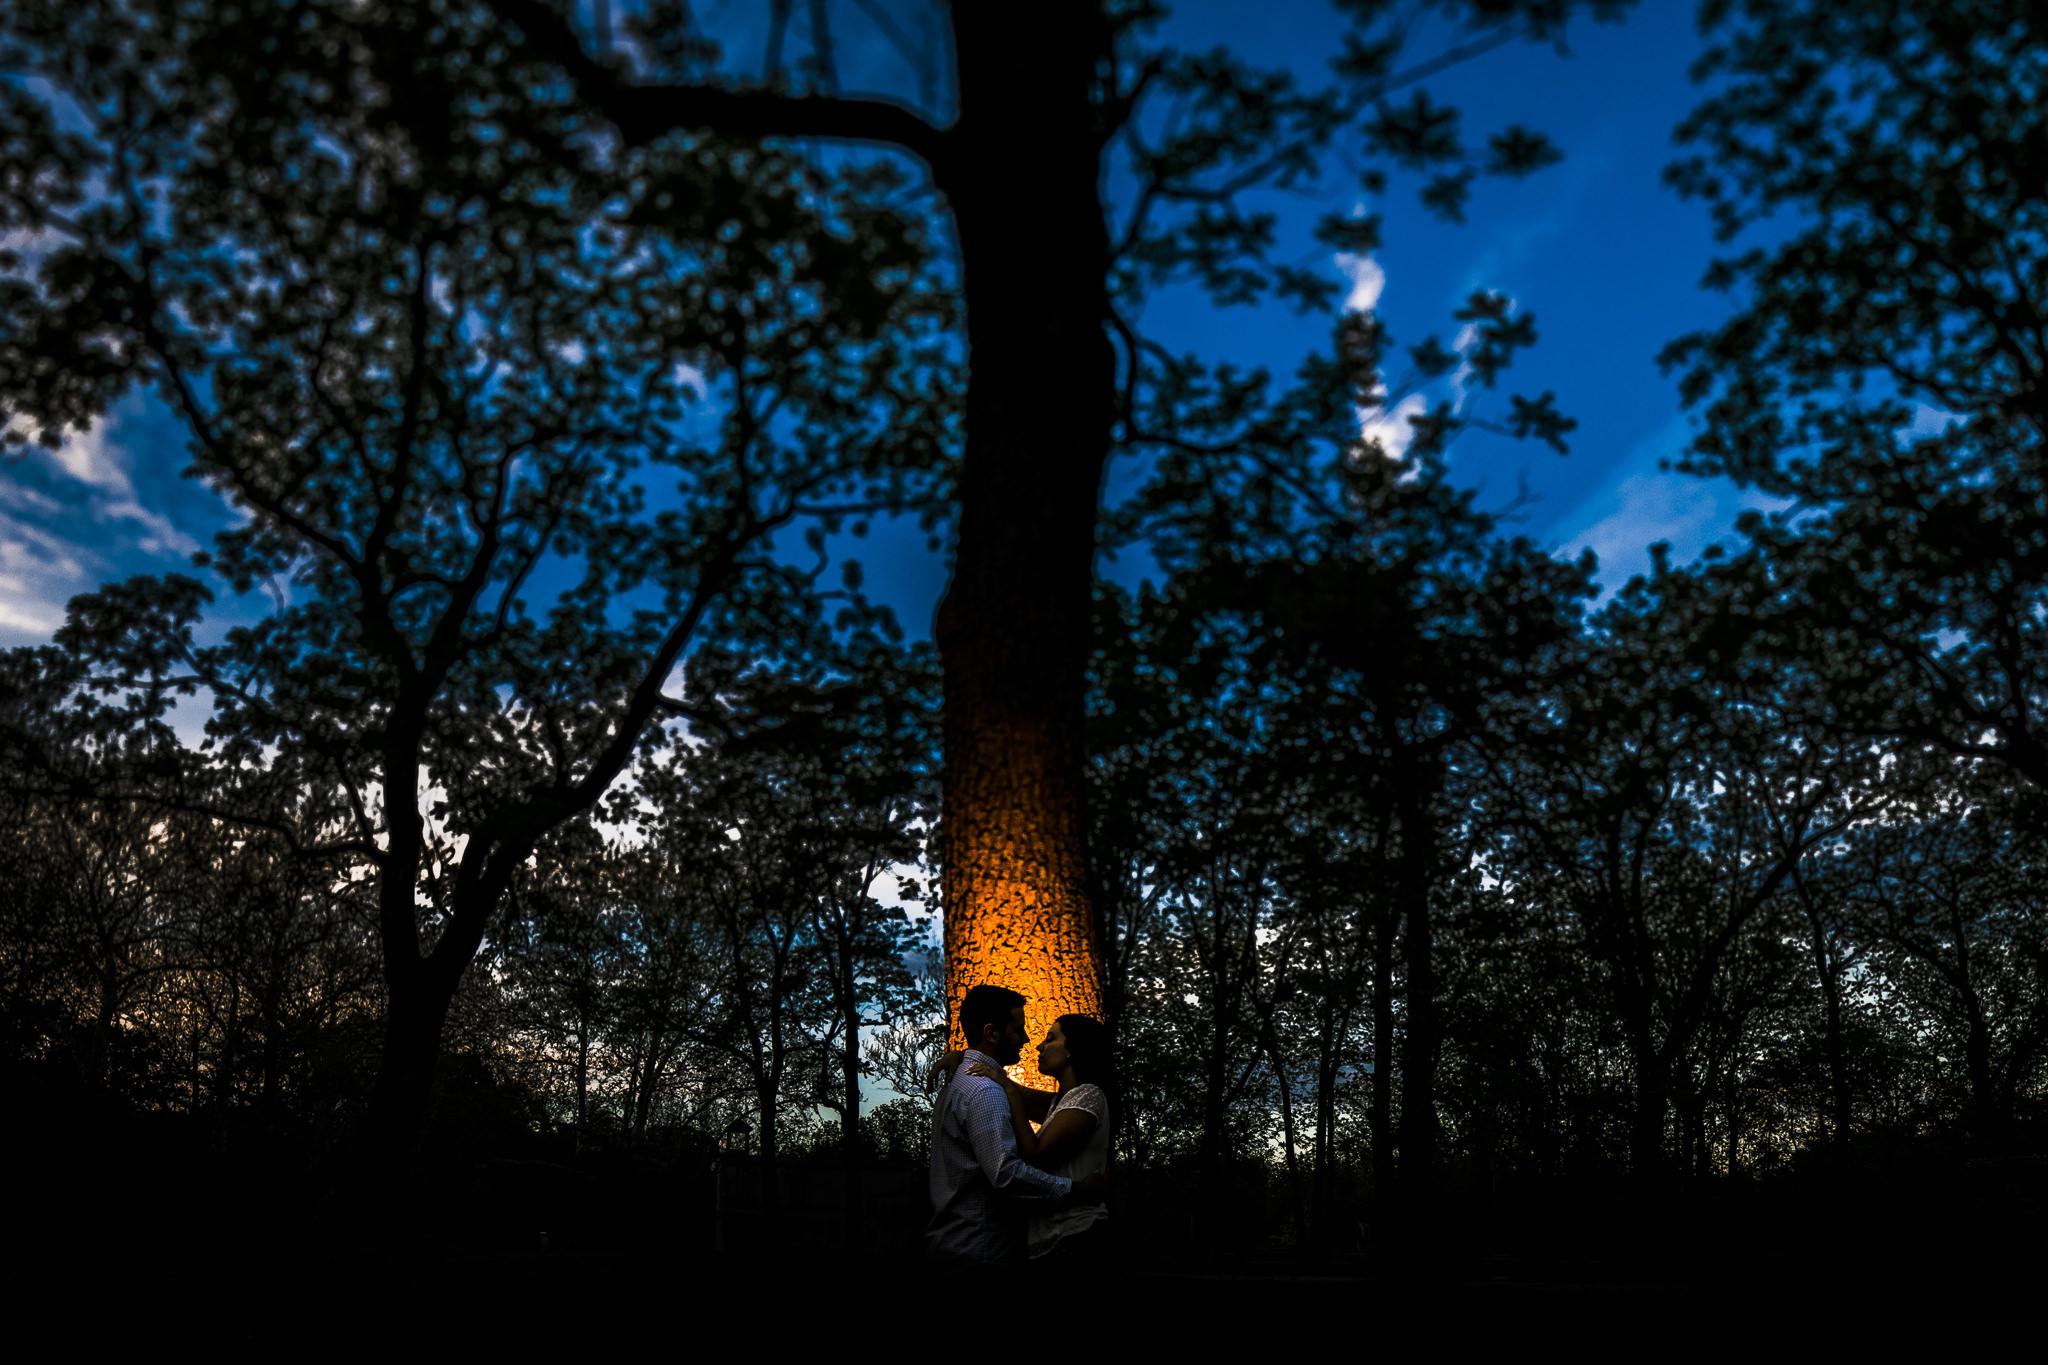 Gilbert-Allaire-State-Park-NJ-Engagement-Photos-06.JPG